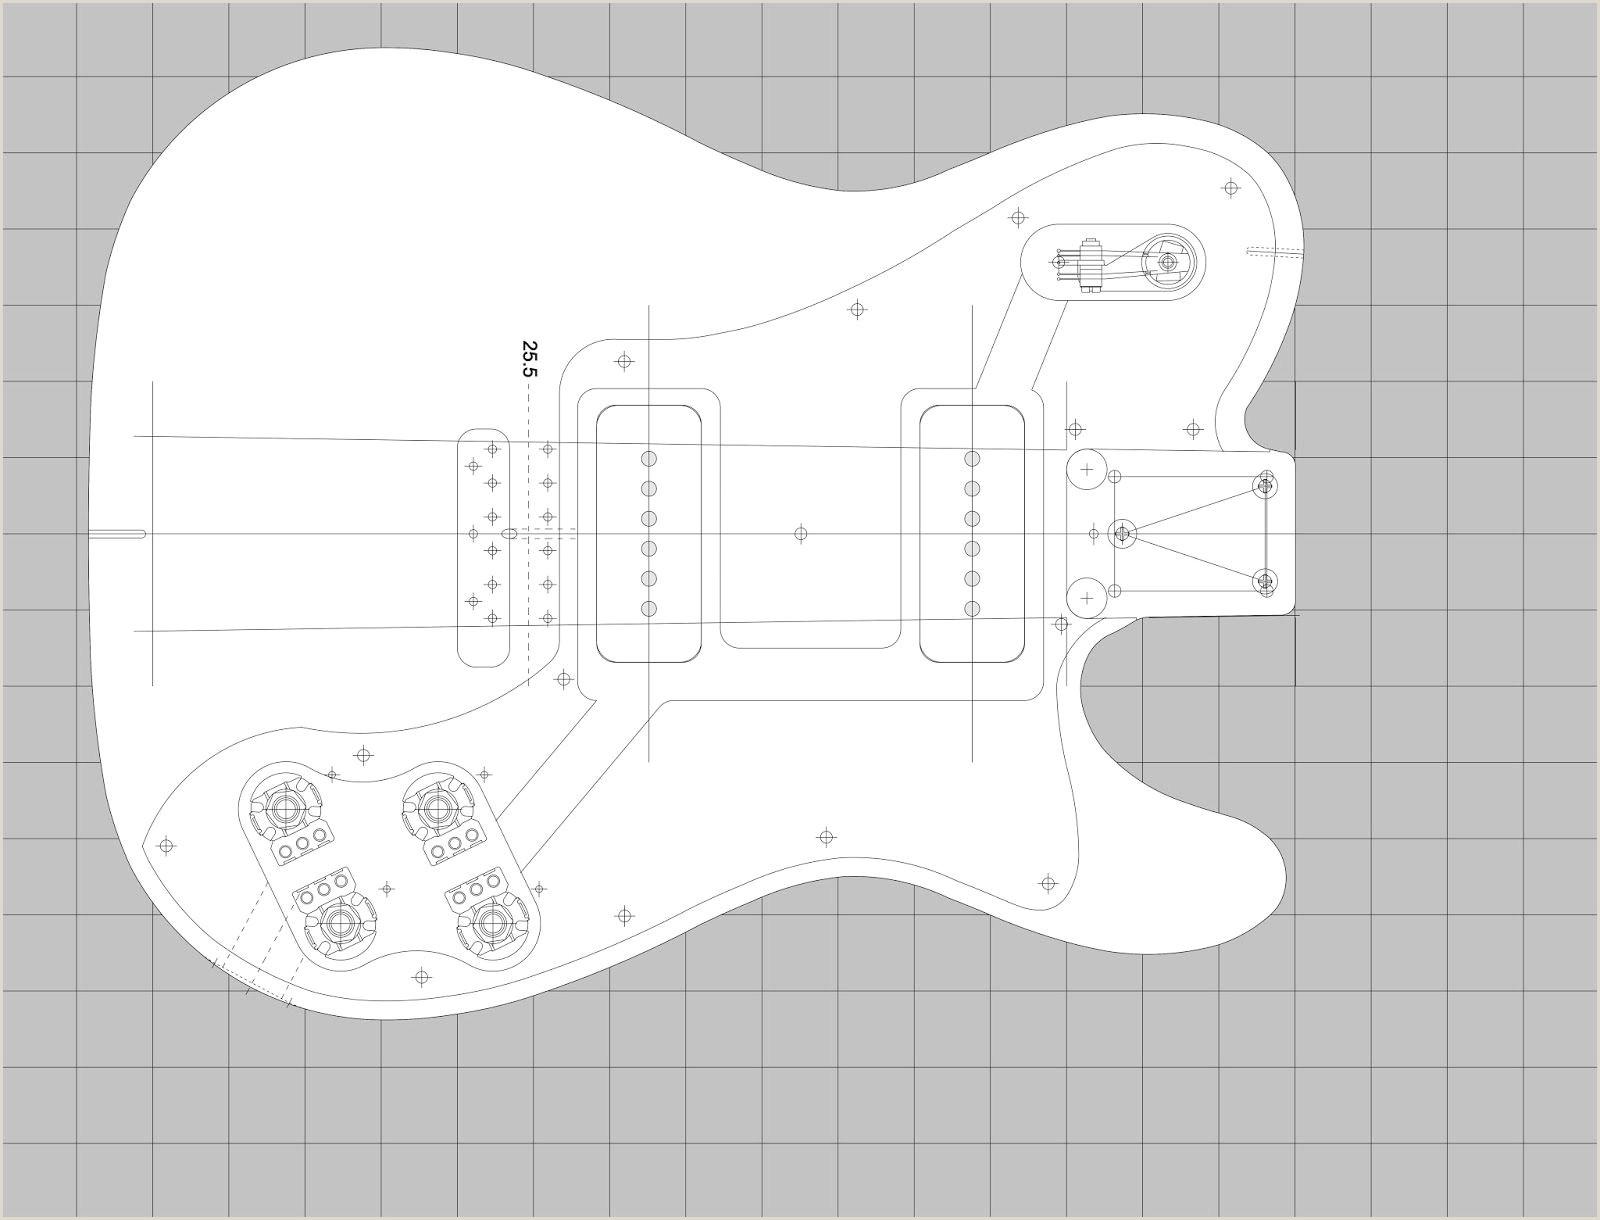 telecaster 72 Custom Deluxe template